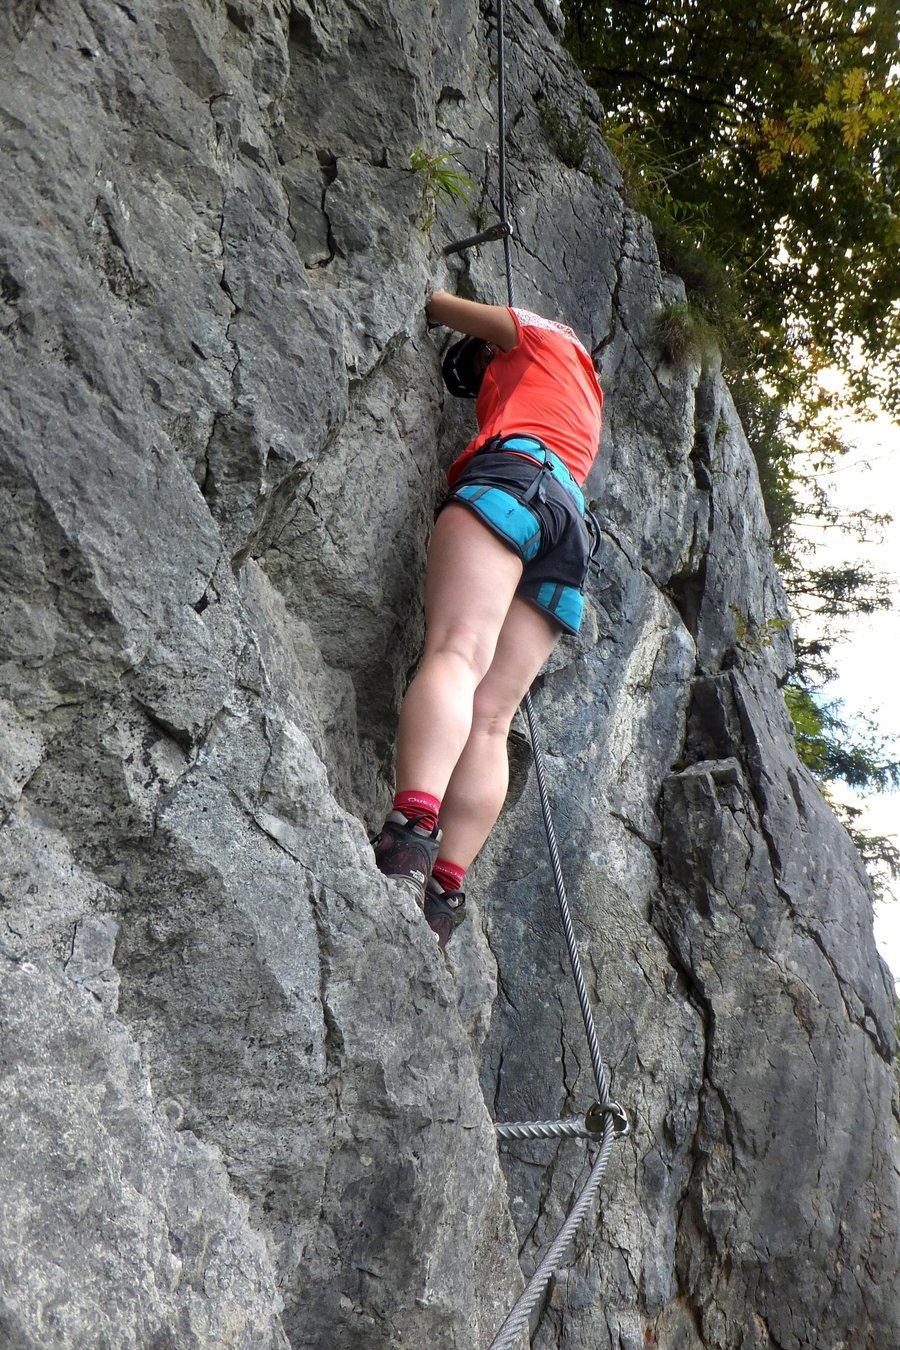 Climbing via ferrata in Weisbach, Salzburg region, Austria